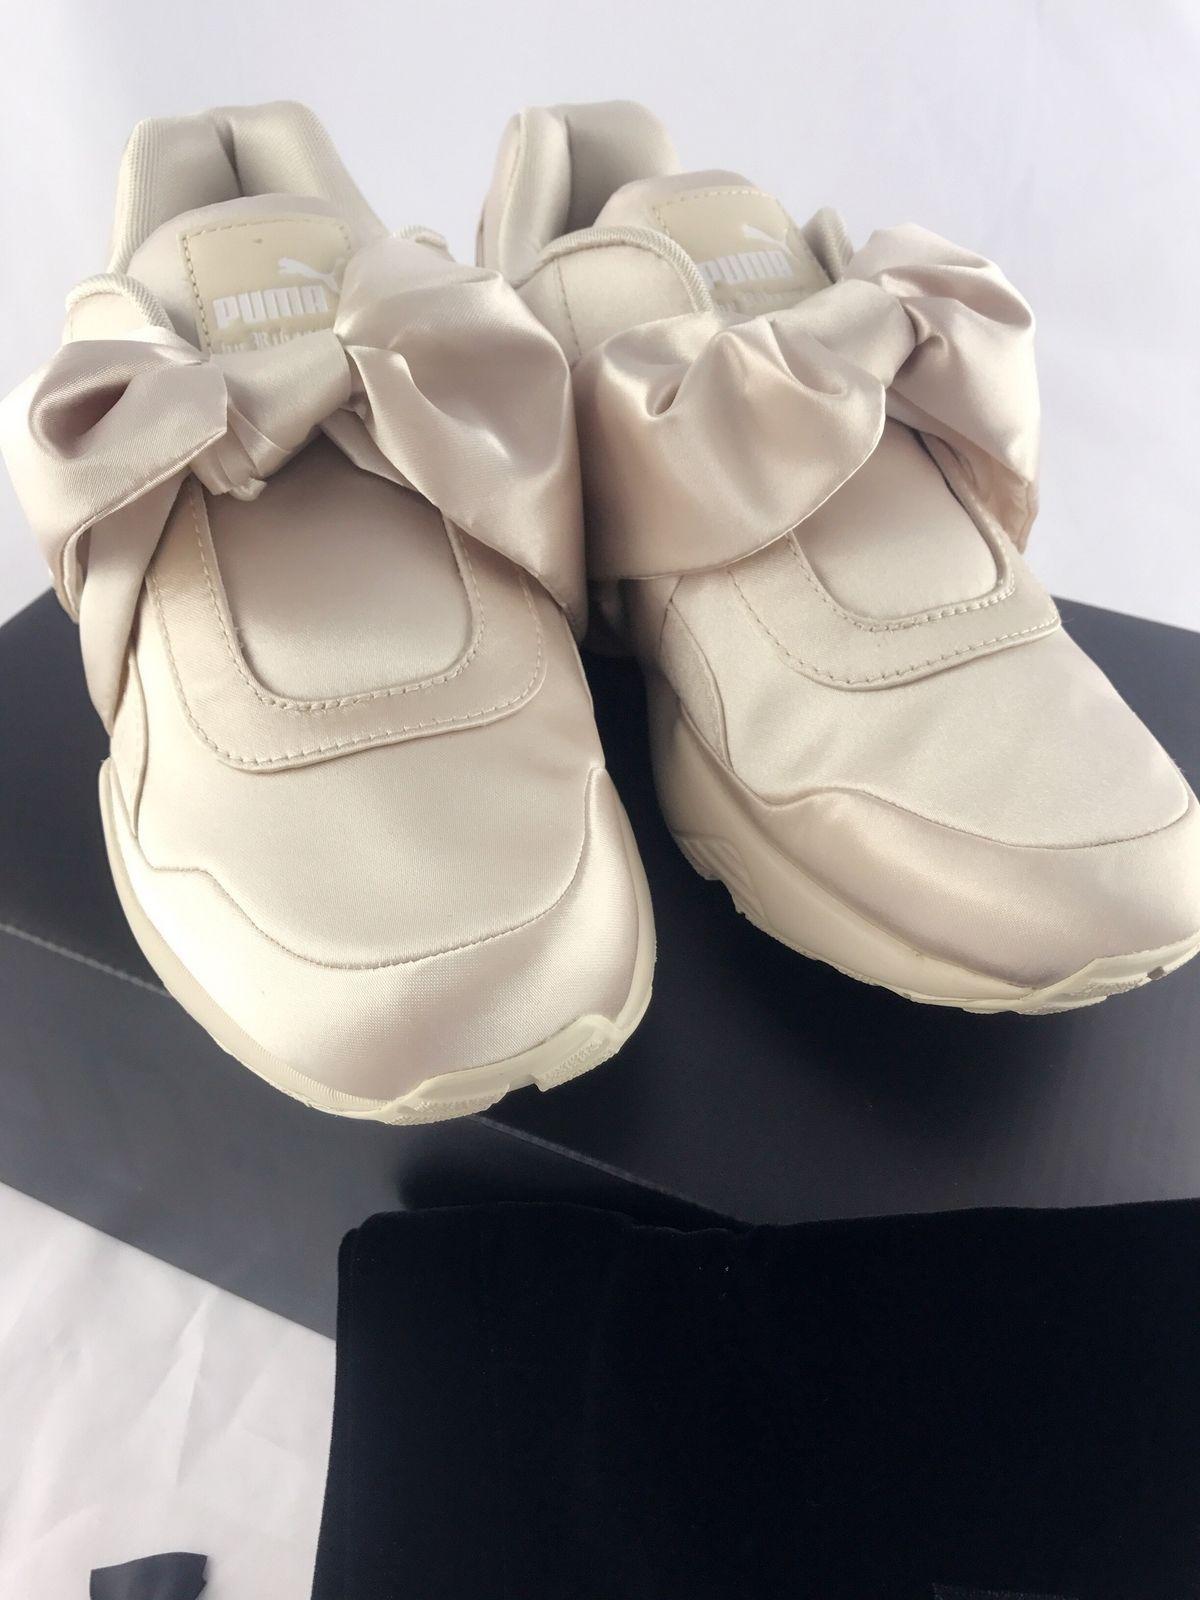 6b79b7633551 NIB Puma Fenty By Rihanna Women Bow Sneaker Pink Tint Beige Size 7.5